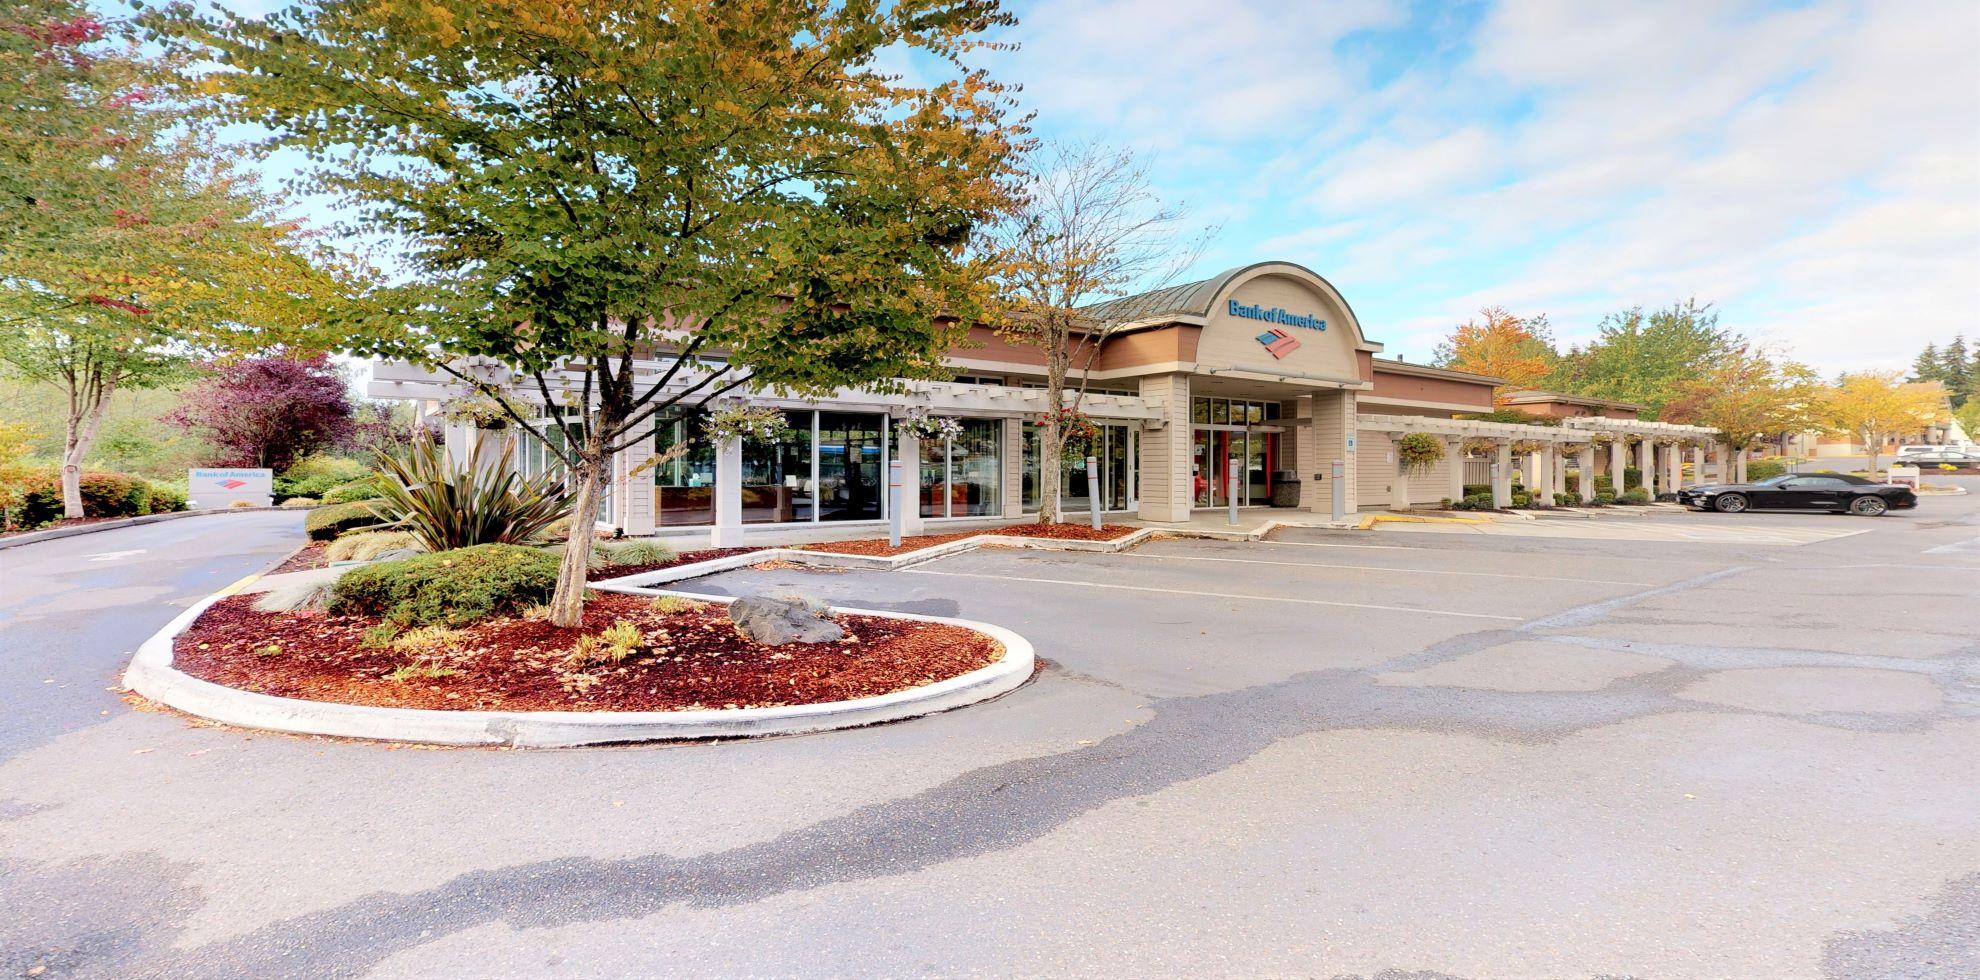 Bank of America financial center with walk-up ATM | 1200 NE Hildebrand Ln, Bainbridge Island, WA 98110